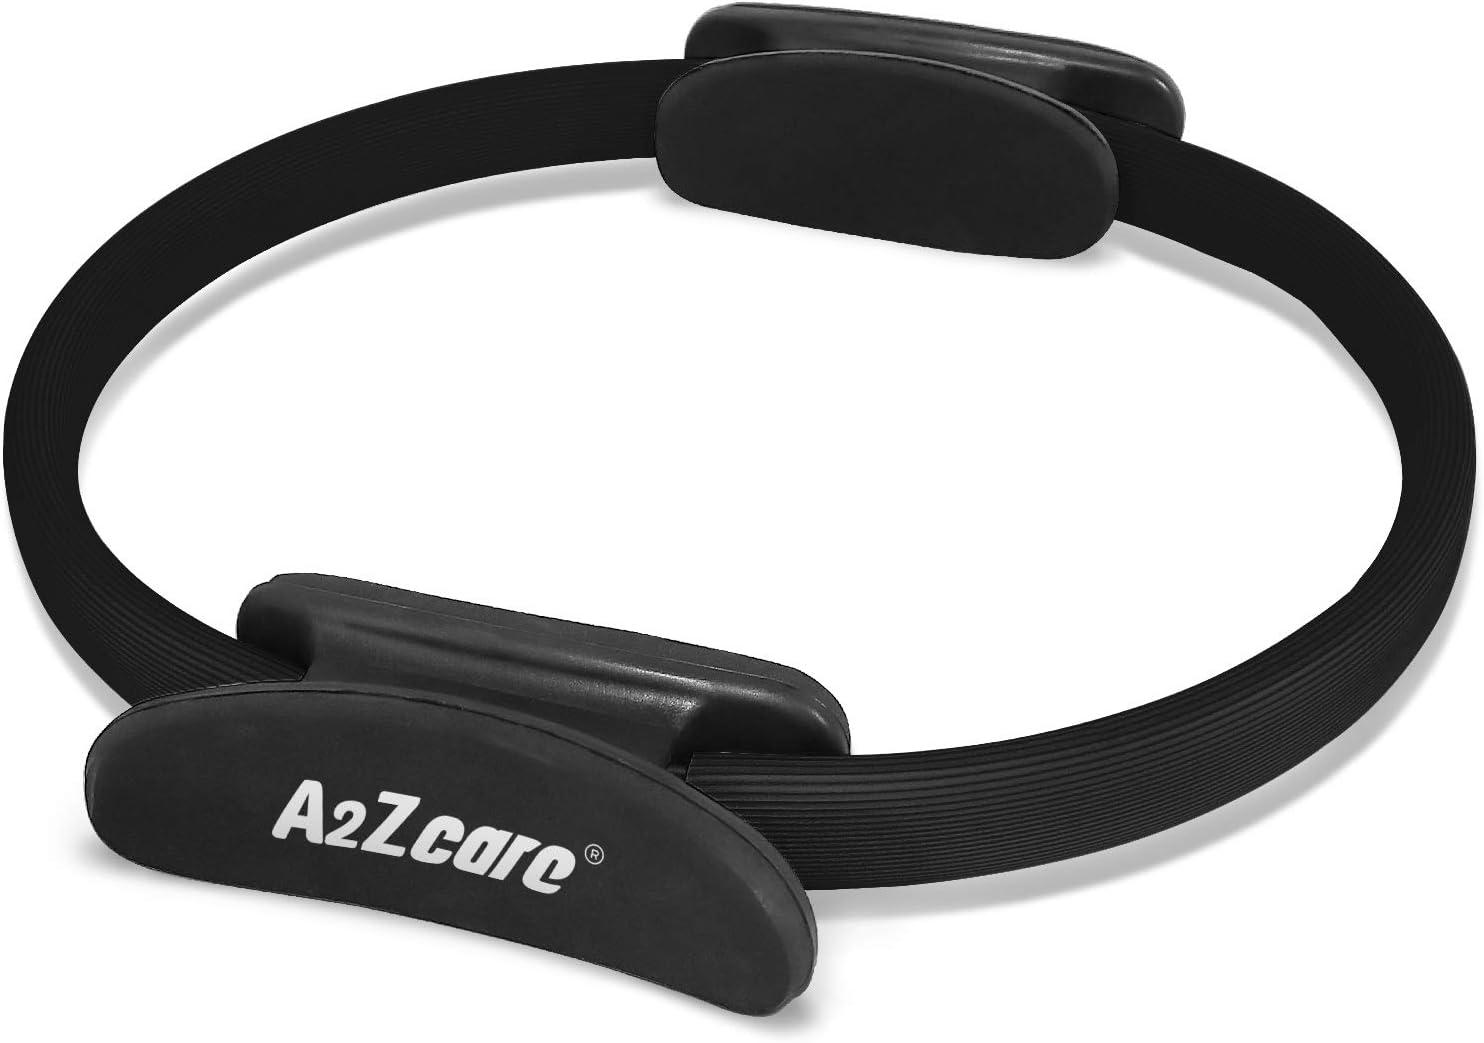 A2ZCARE Pilates Ring Magic Aerobics Circle Gym Max 65% OFF Yoga Free Shipping New